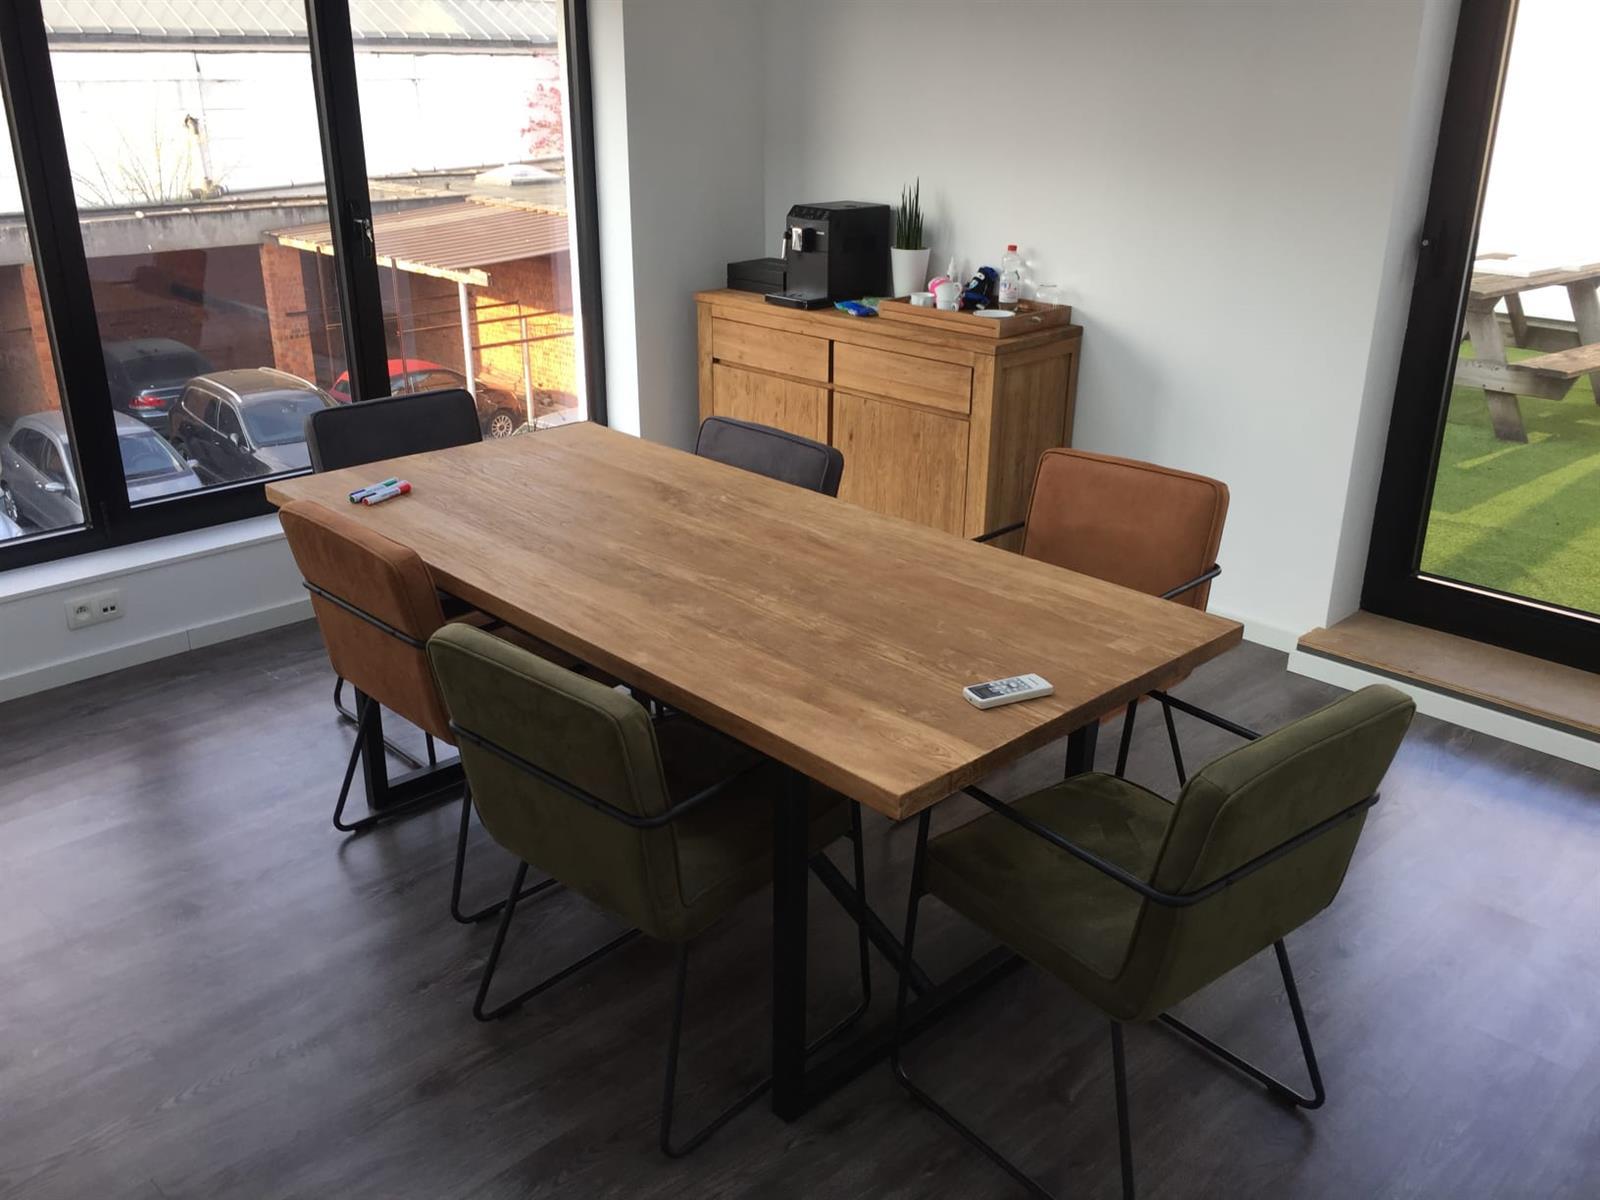 kantoor te huur K003 - Middelmolenlaan 96, 2100 Antwerpen Deurne, België 14